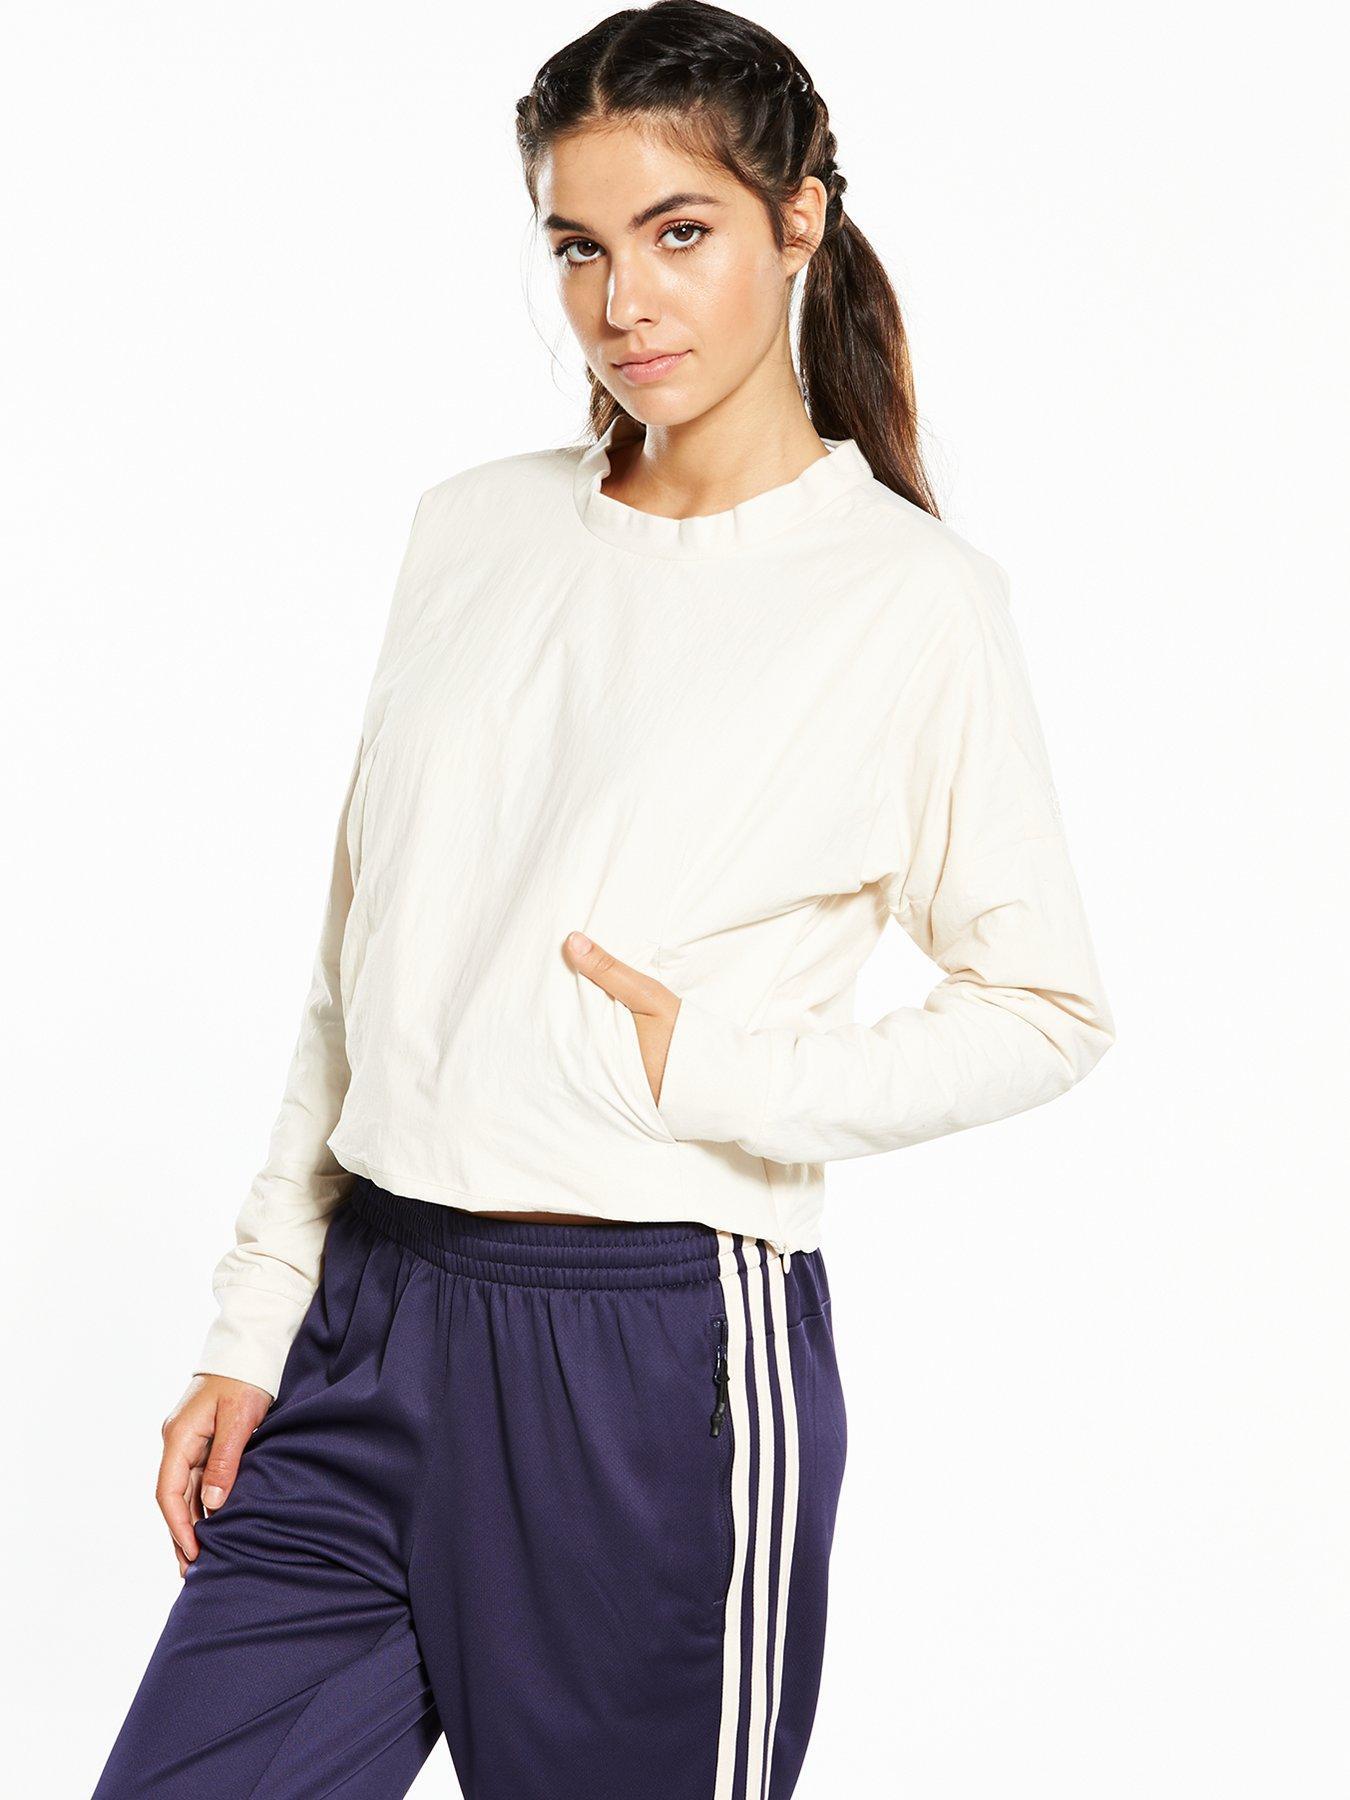 1350x1800 Adidas Athletics Cocoon Sweater